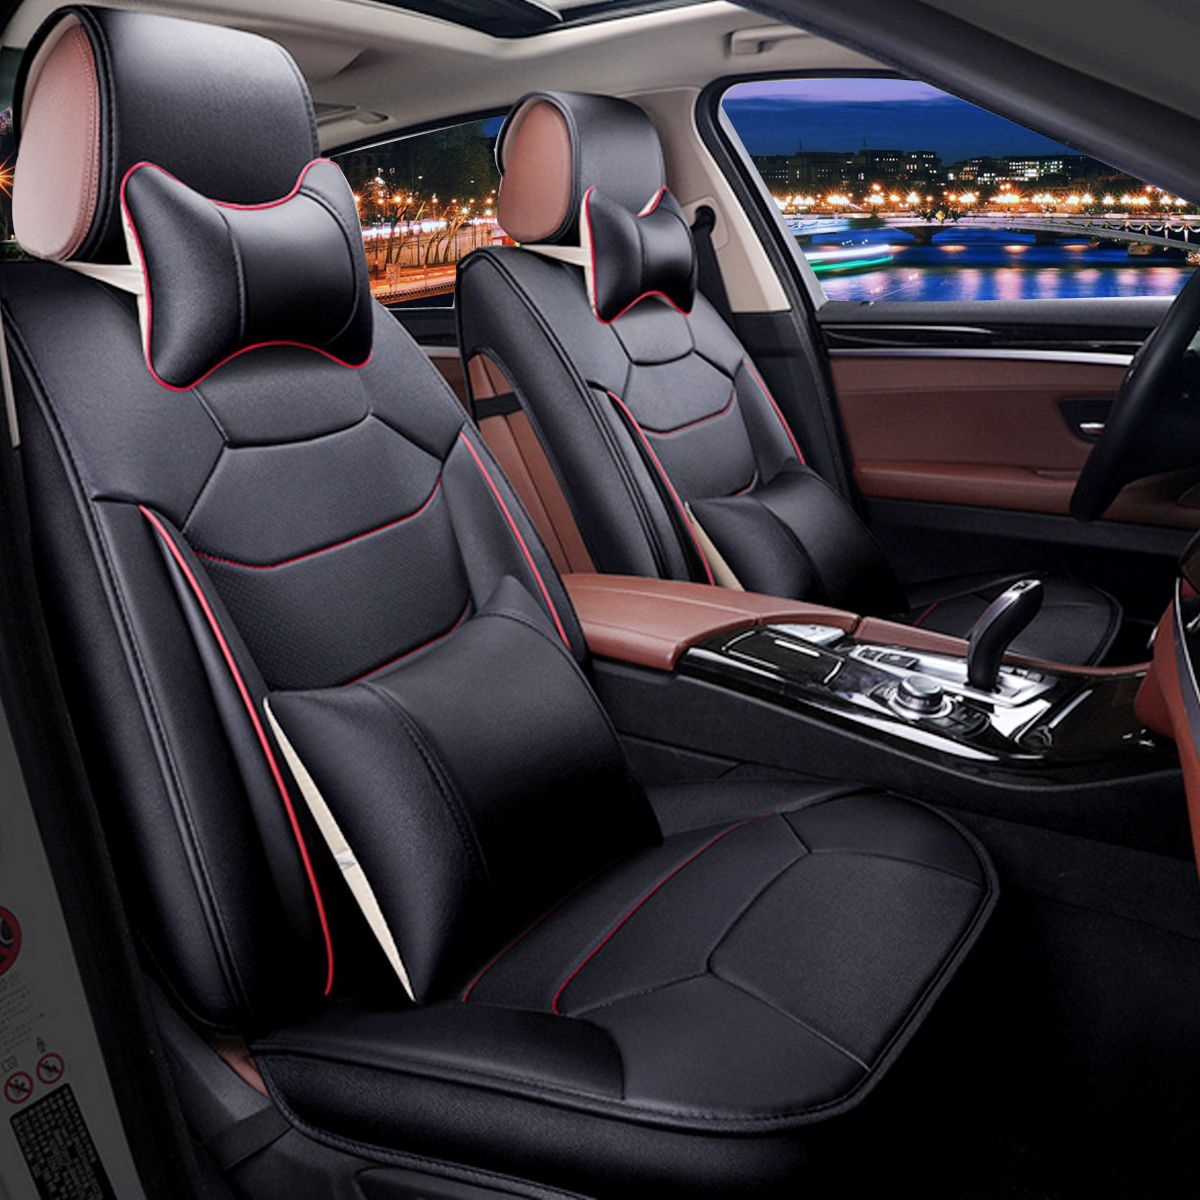 Grtsunsea Deluxe 13Pcs 5 Seats Car PU Leather Full